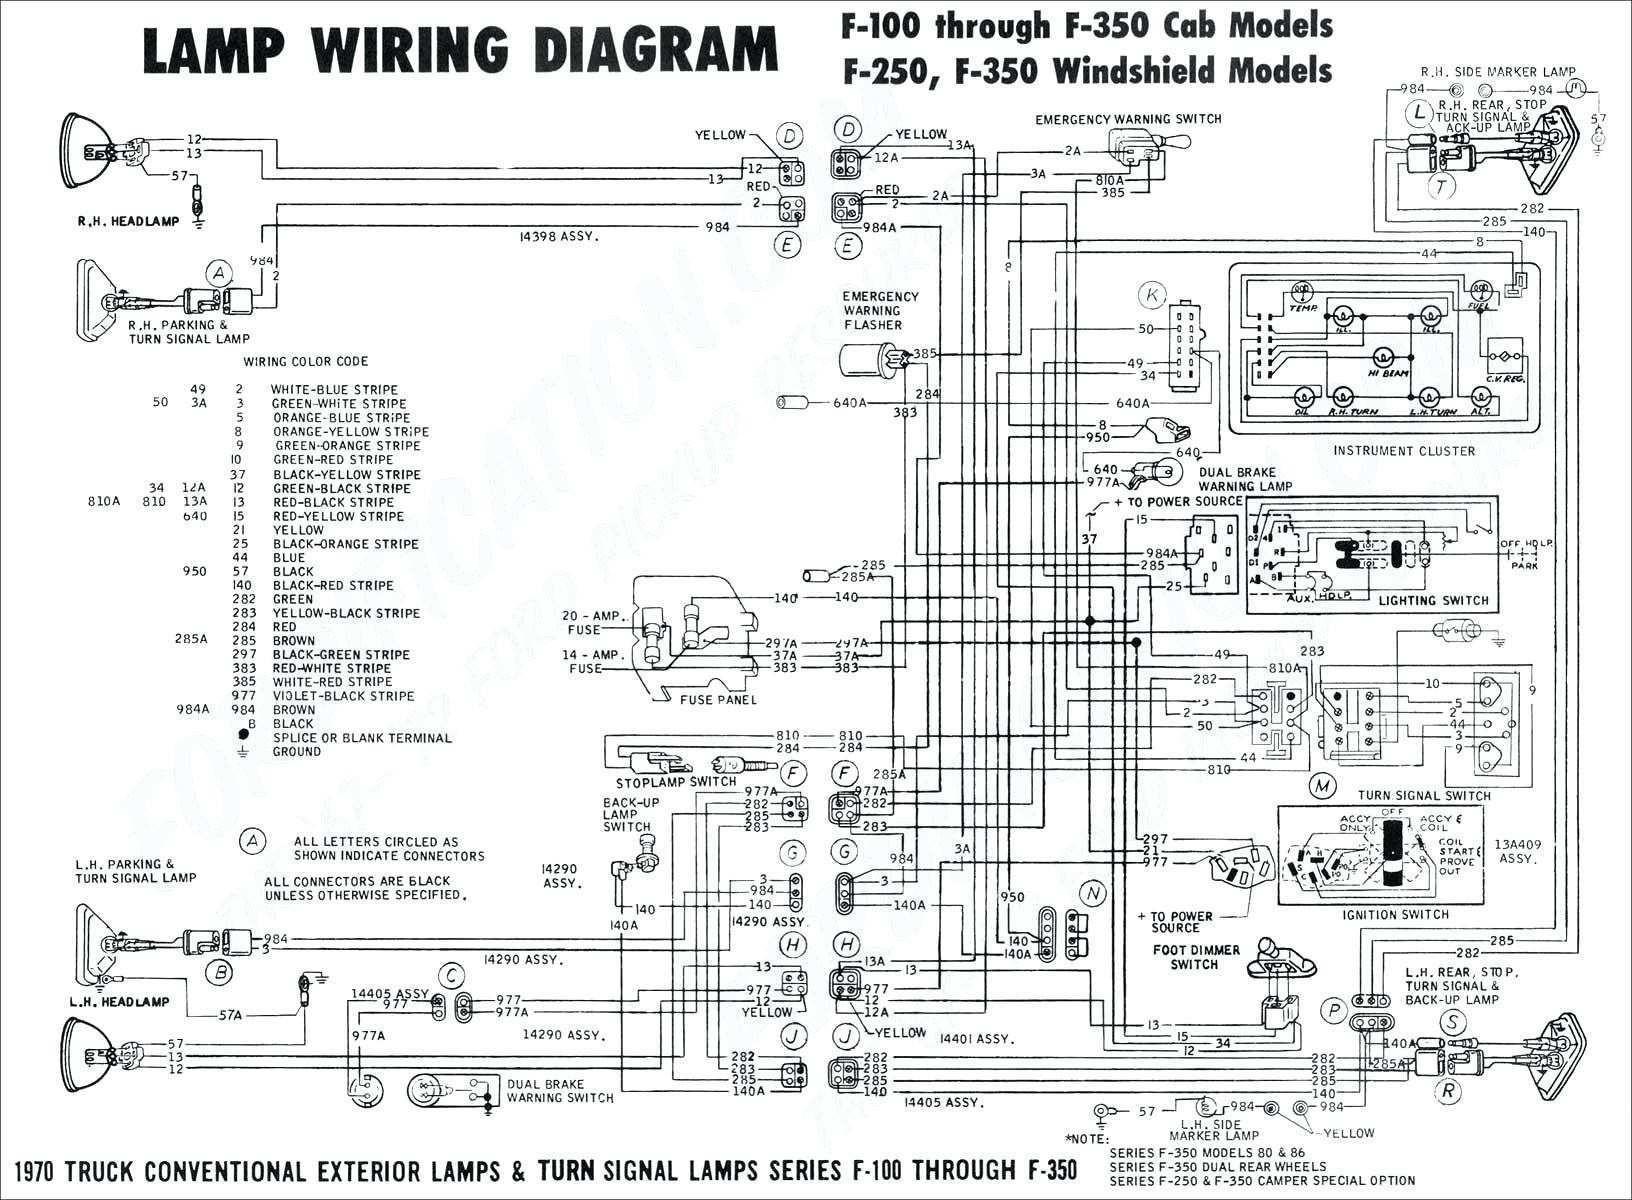 4 Stroke Dirt Bike Engine Diagram Xtreme Box Wiring Diagram Two Stroke Dirt Bike Diagram Dirt Of 4 Stroke Dirt Bike Engine Diagram